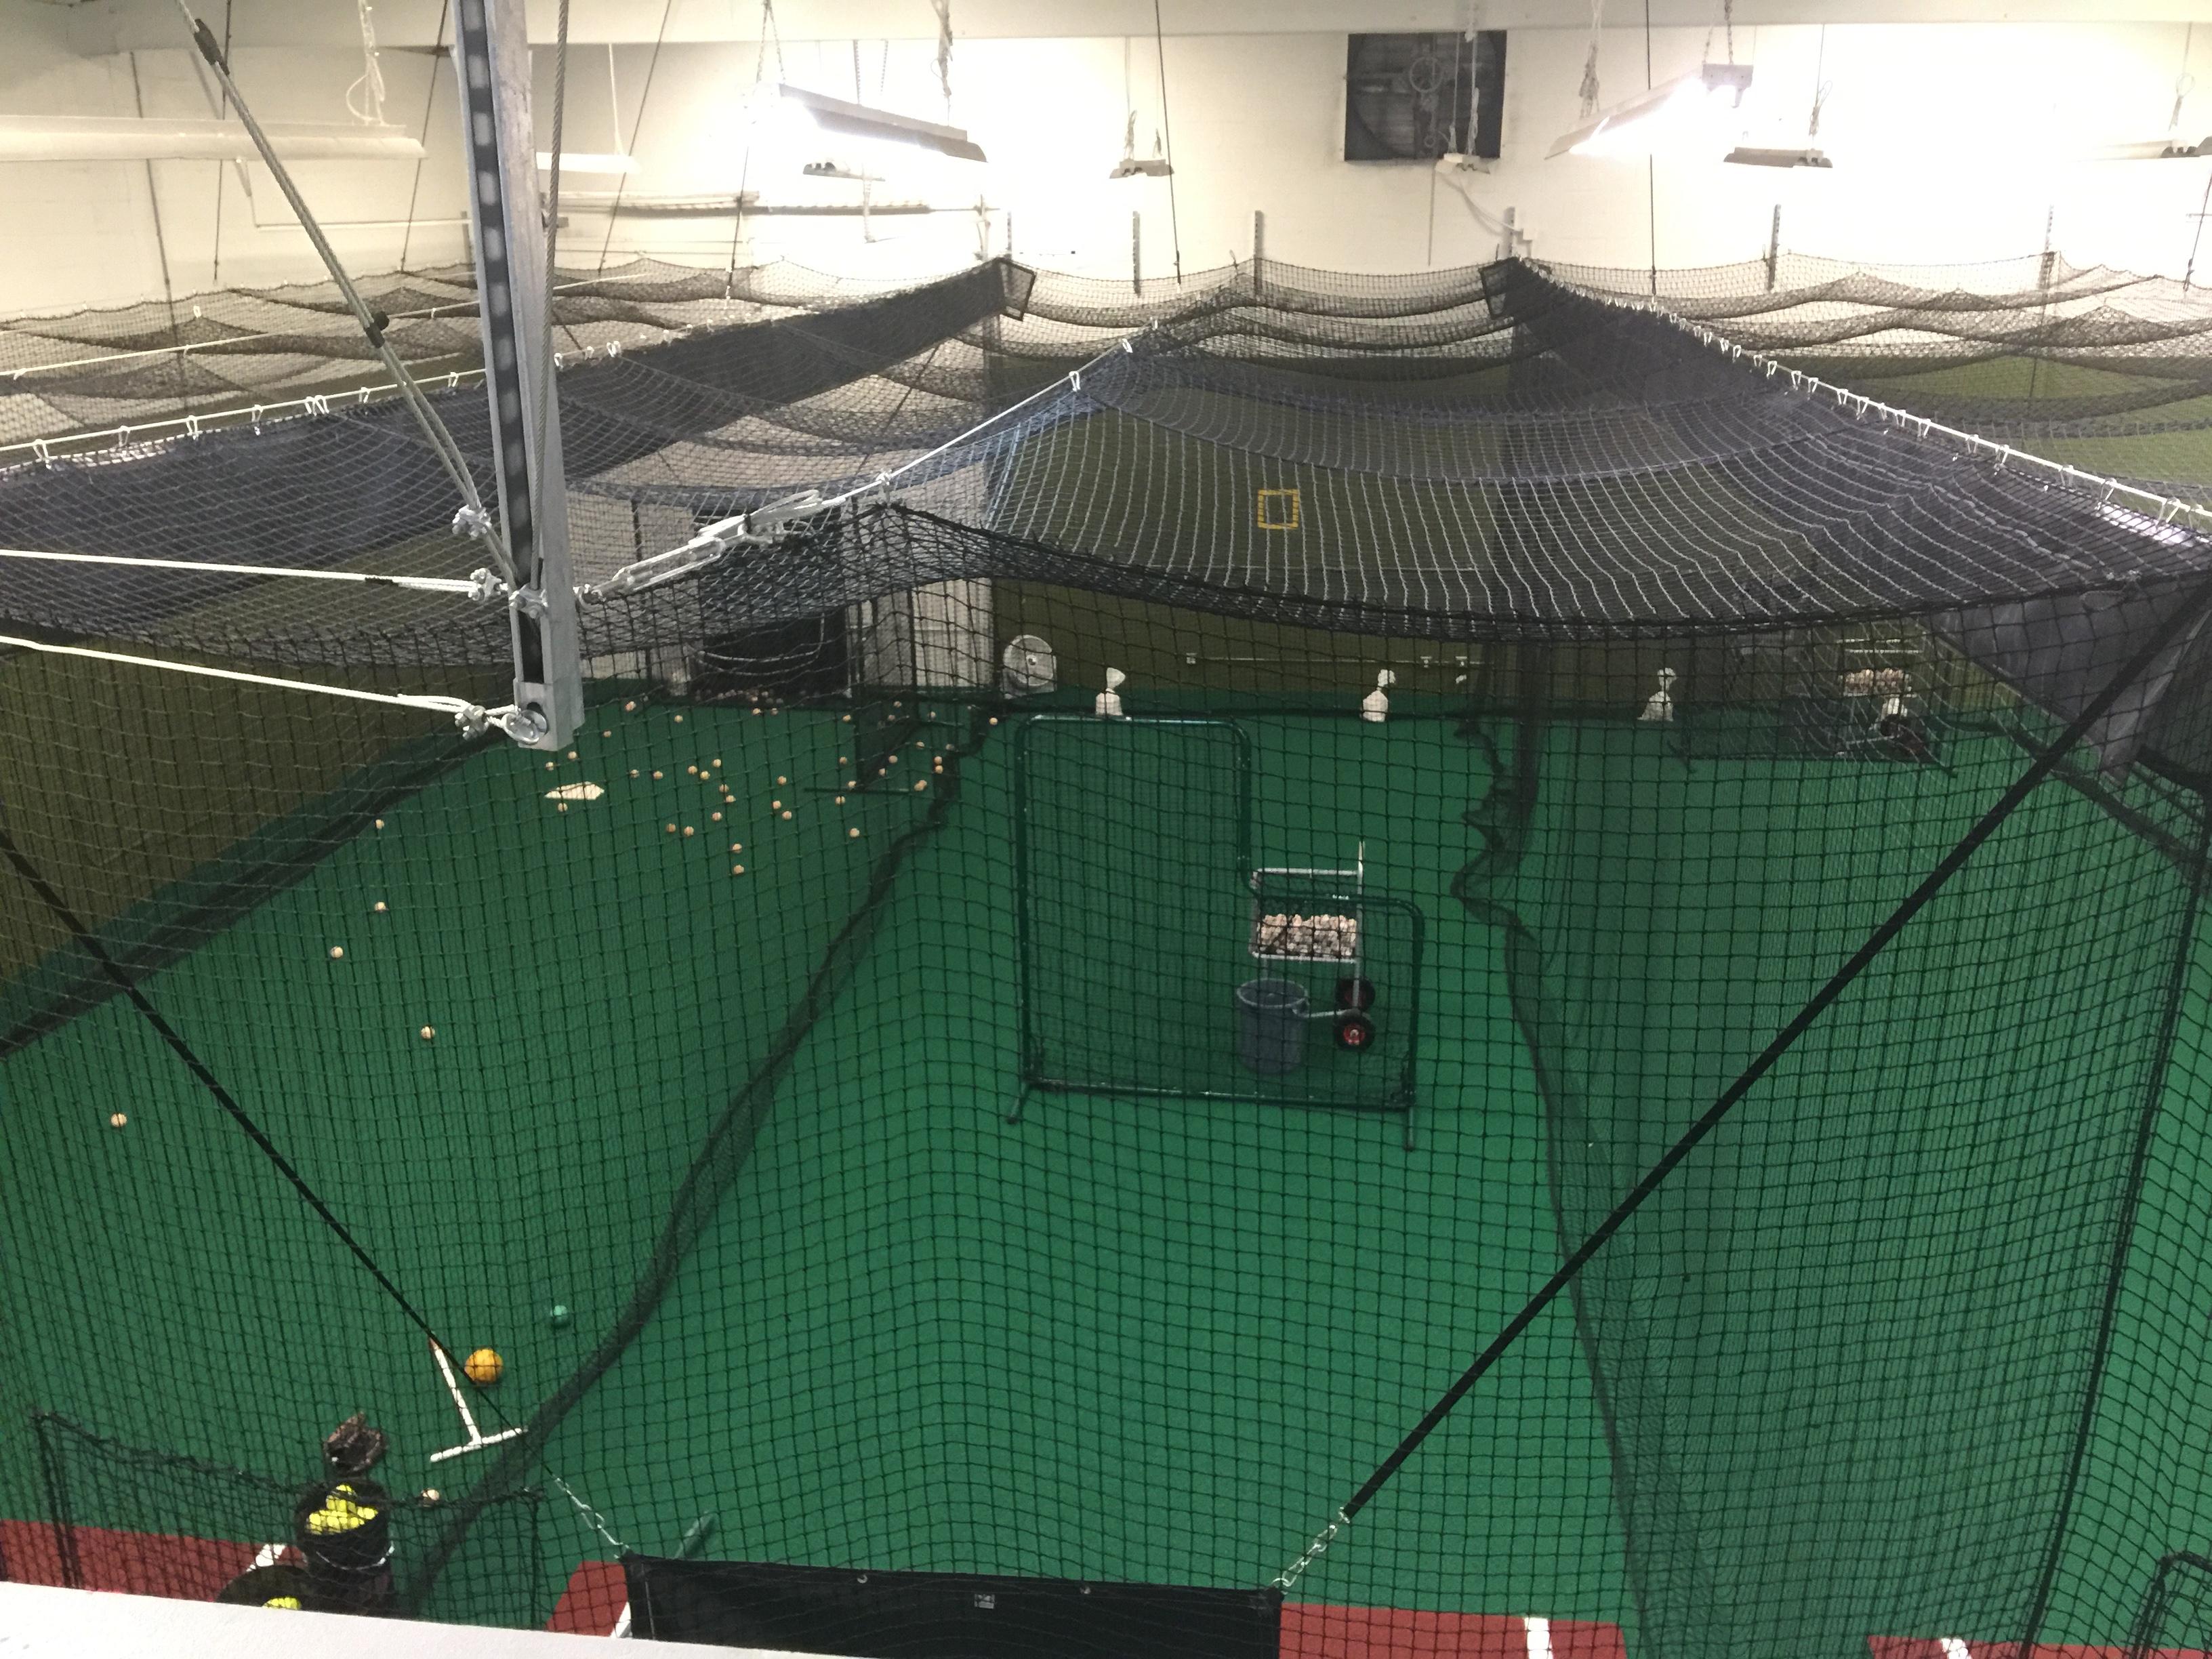 NextUp Baseball Academy